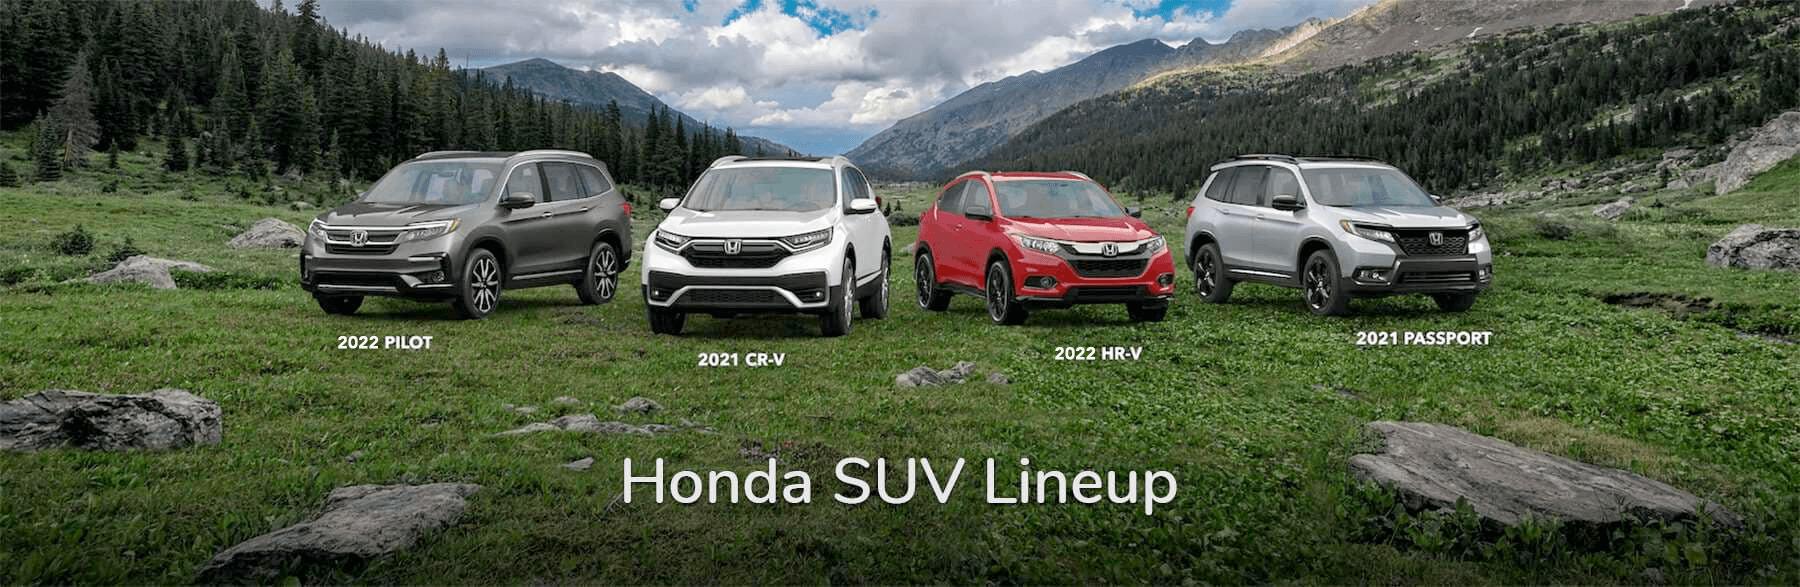 Honda SUV Lineup Vern Eide Honda Sioux Falls Slider